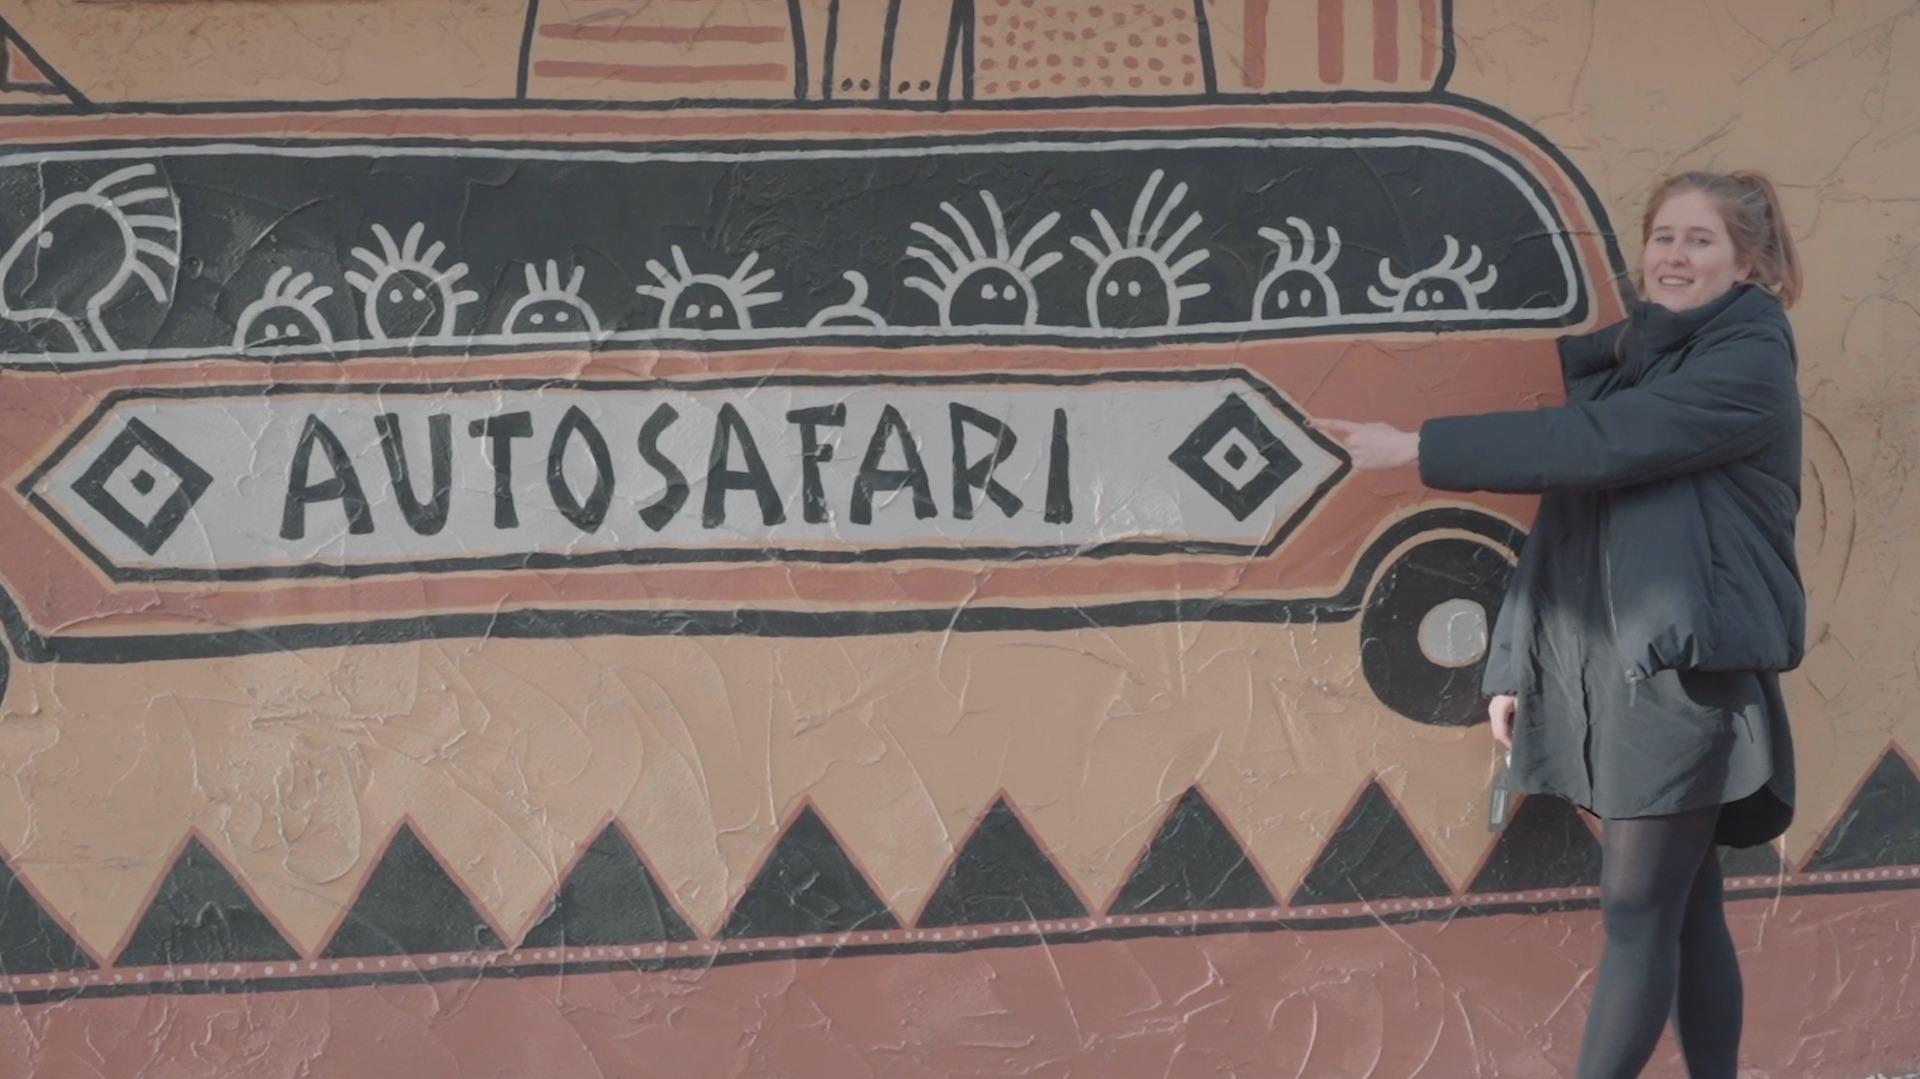 Inge autosafari